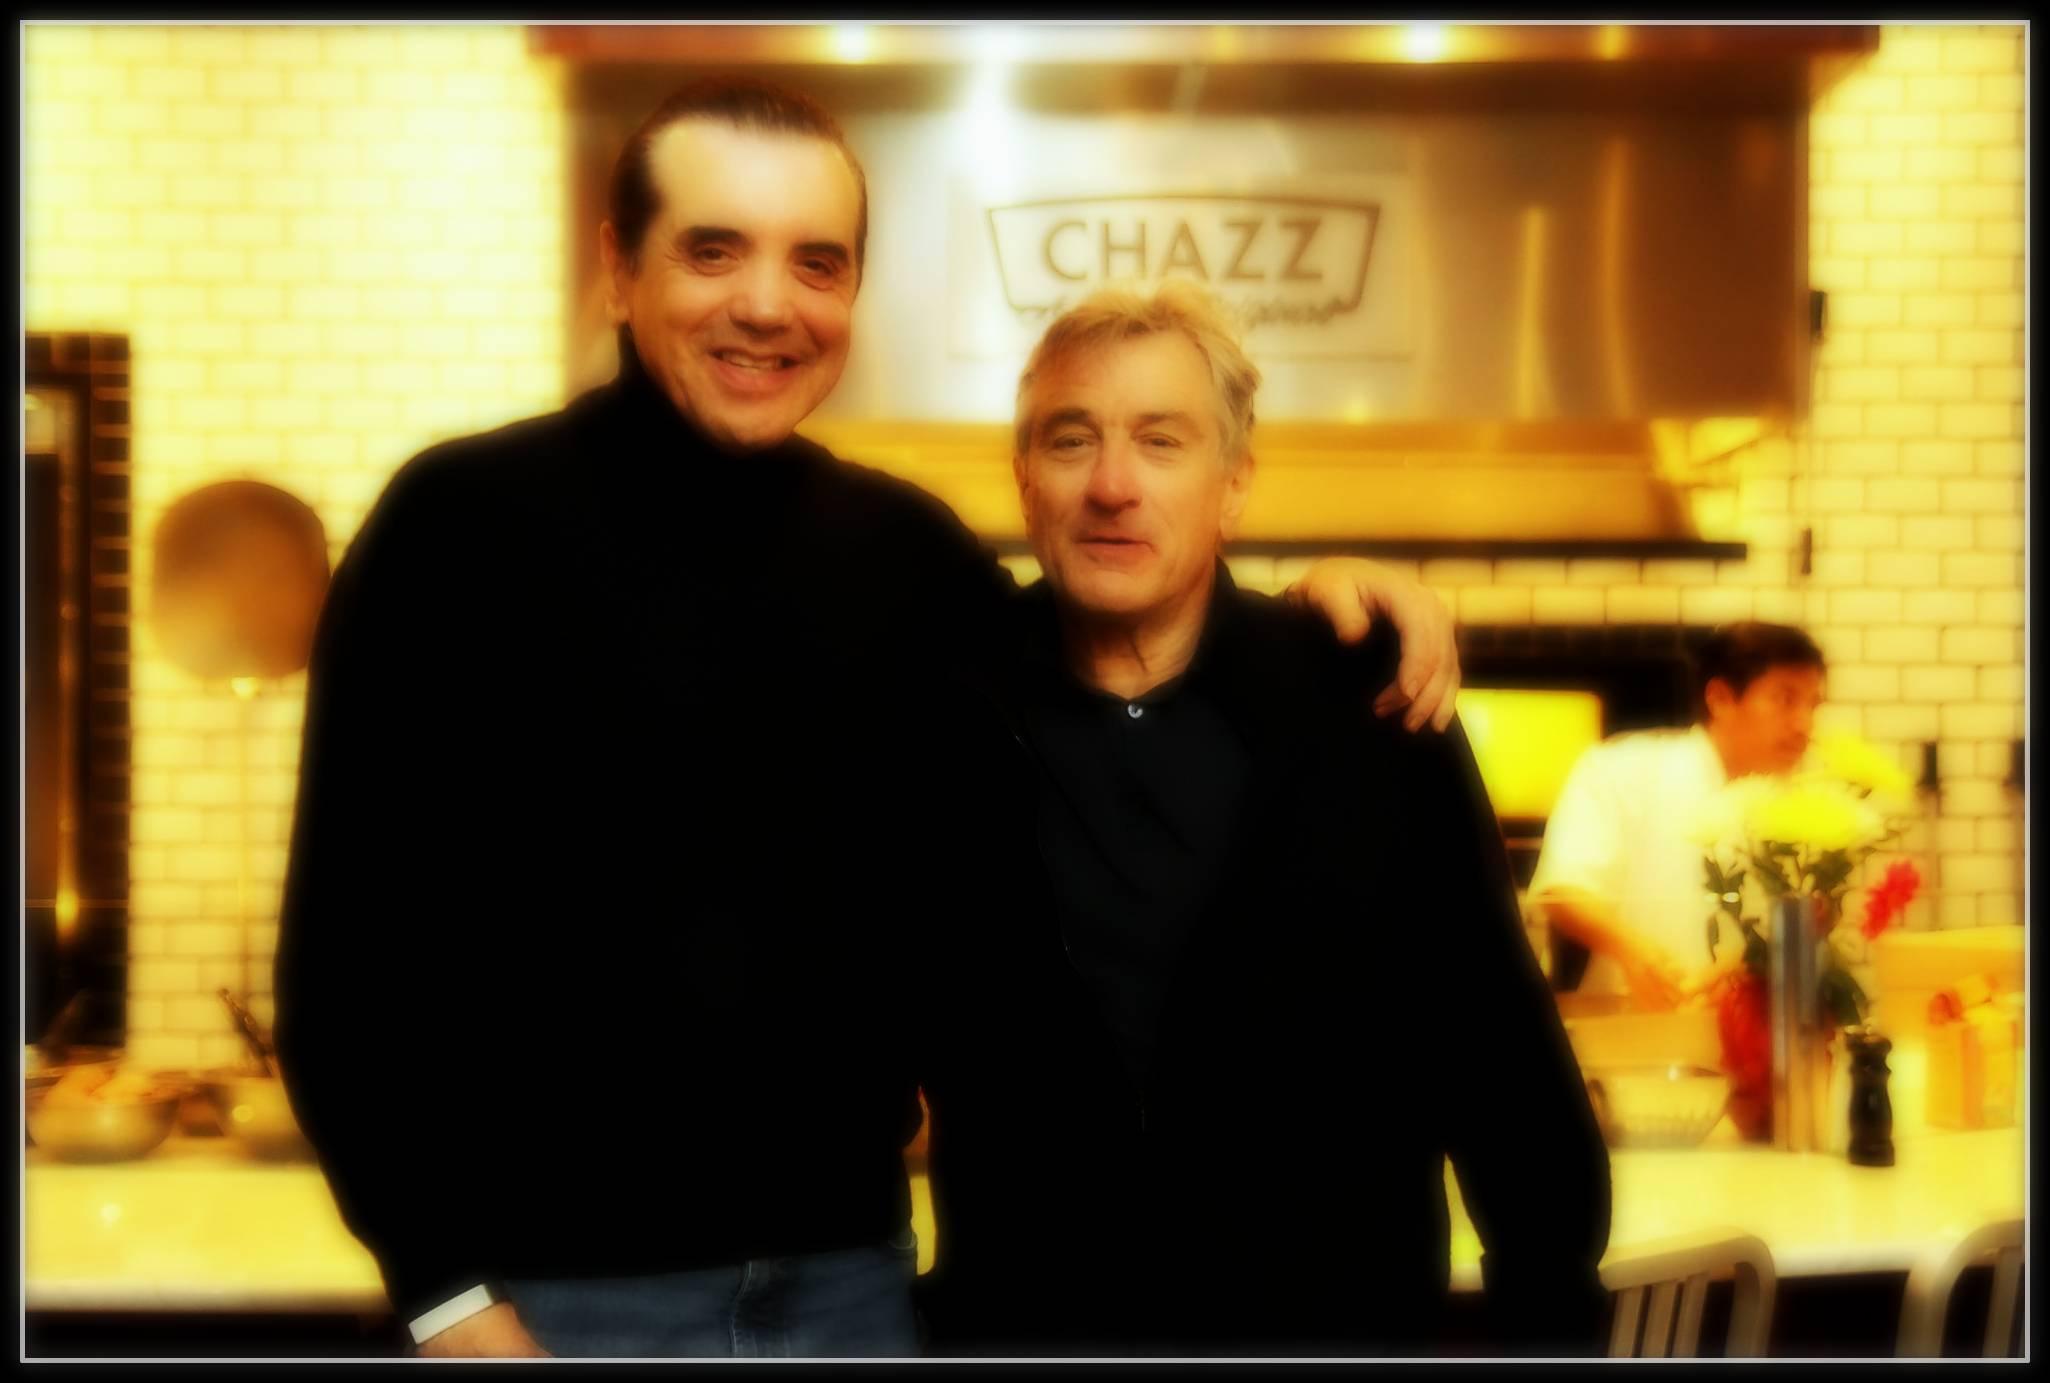 Bronx Chazz De Niro